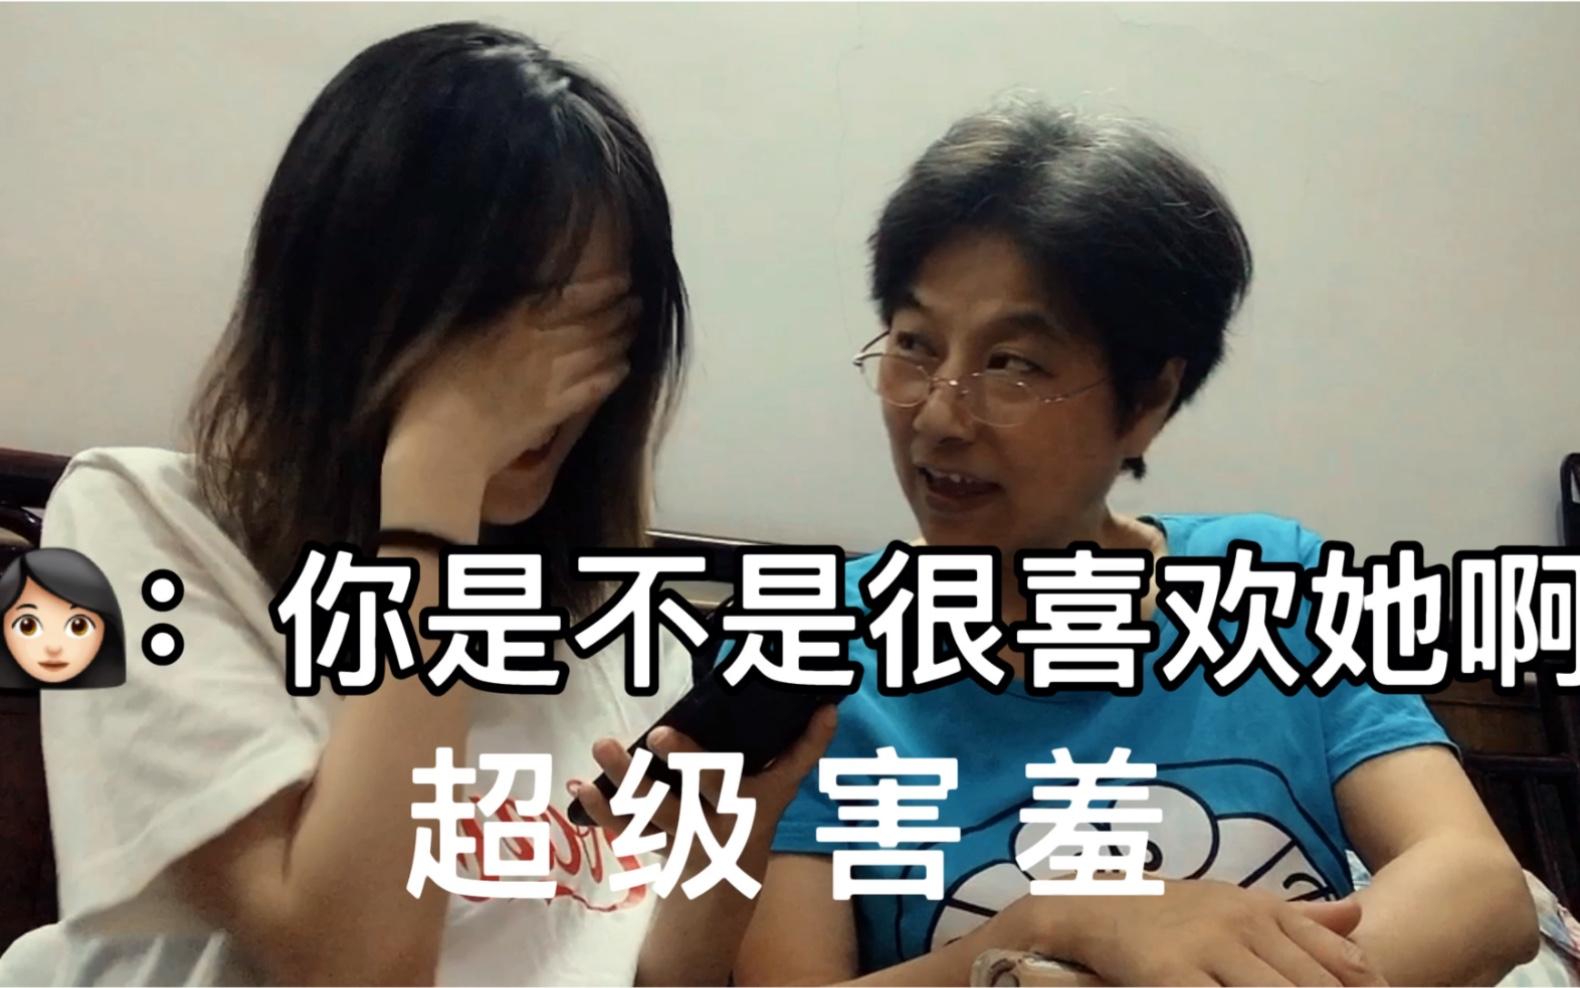 【KK&花卷】和已出柜女友妈妈一起给女友挑扭蛋/扭蛋开箱 Vlog.007#